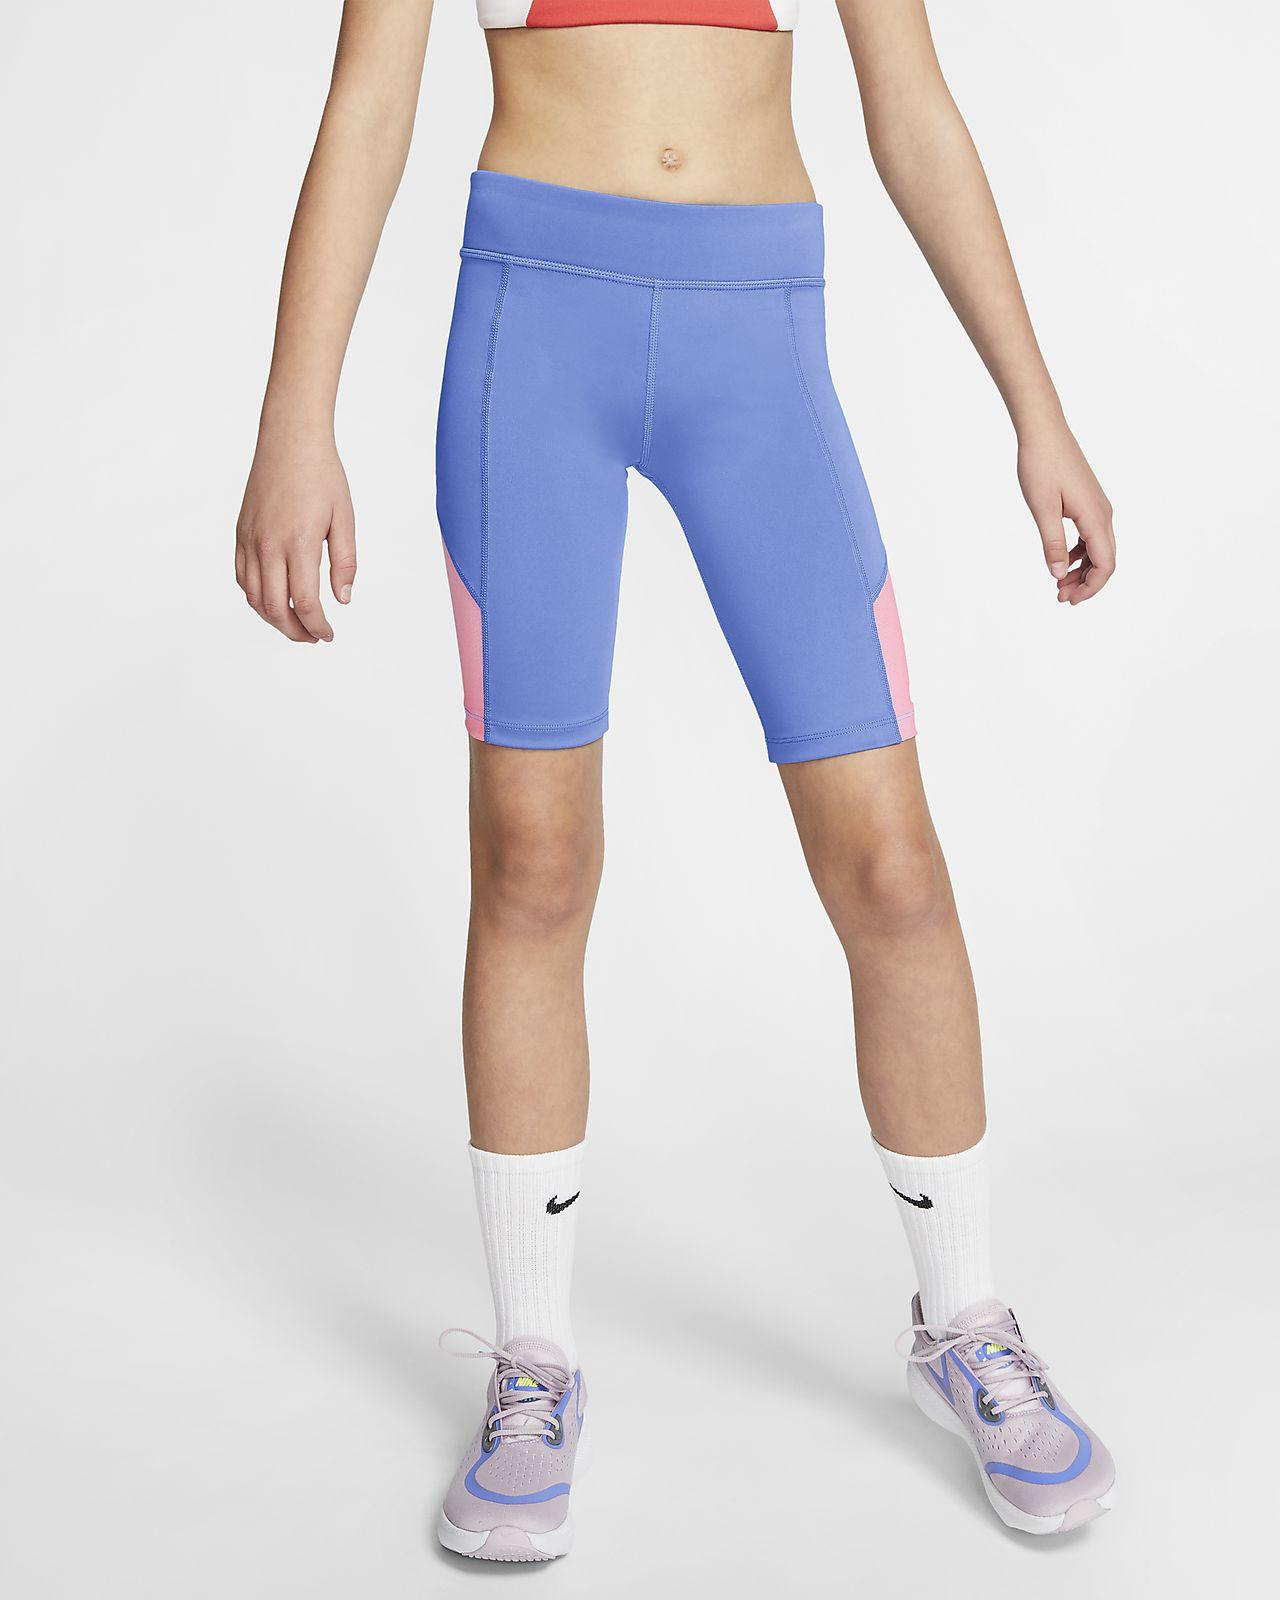 Shorts de ciclismo para entrenamiento para niña talla grande Nike Trophy